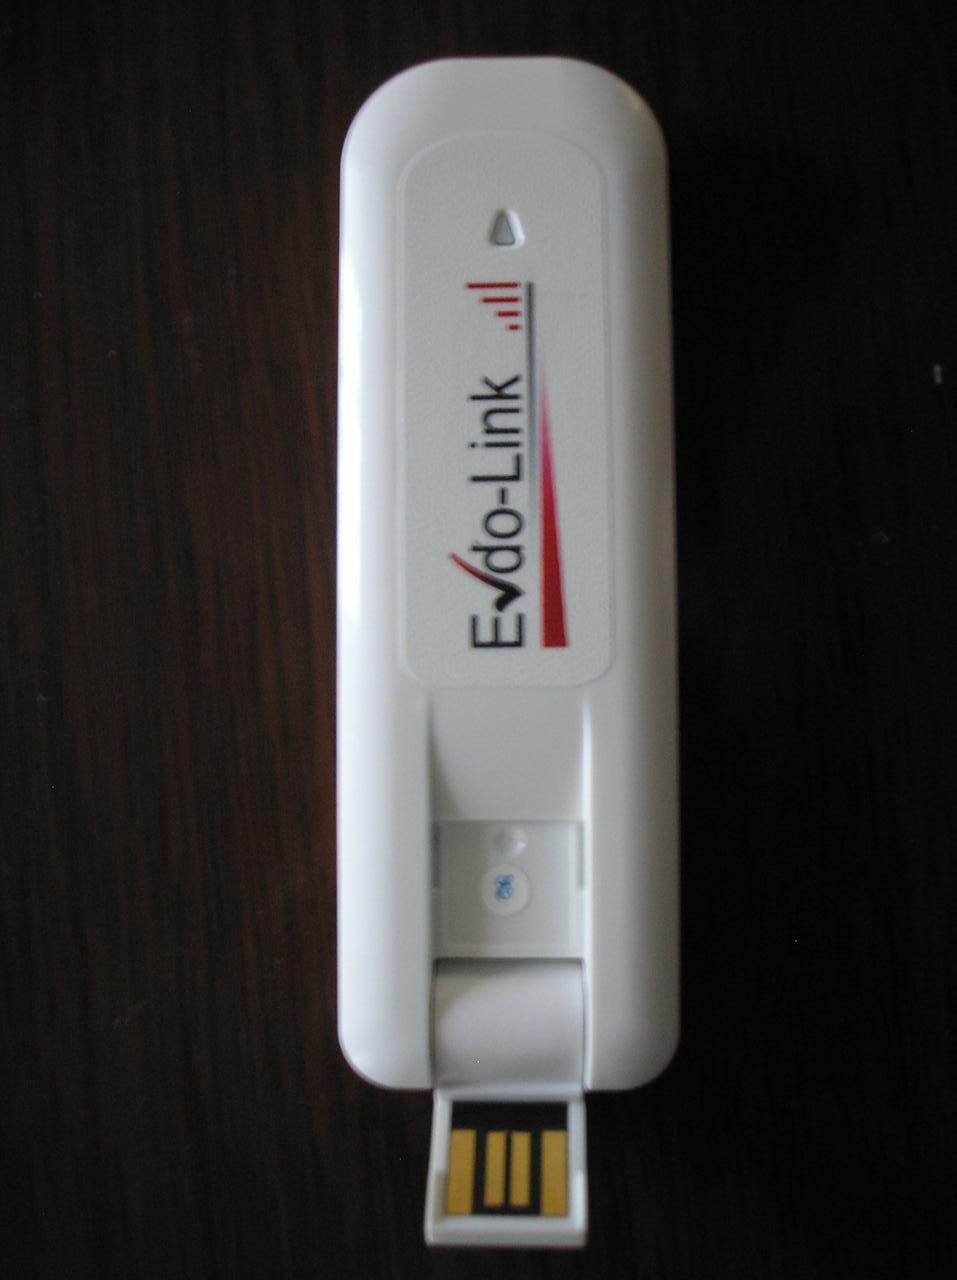 Evdo-Link EL3277 3G DC-HSPA+ USB модем 42 Мбит/сек